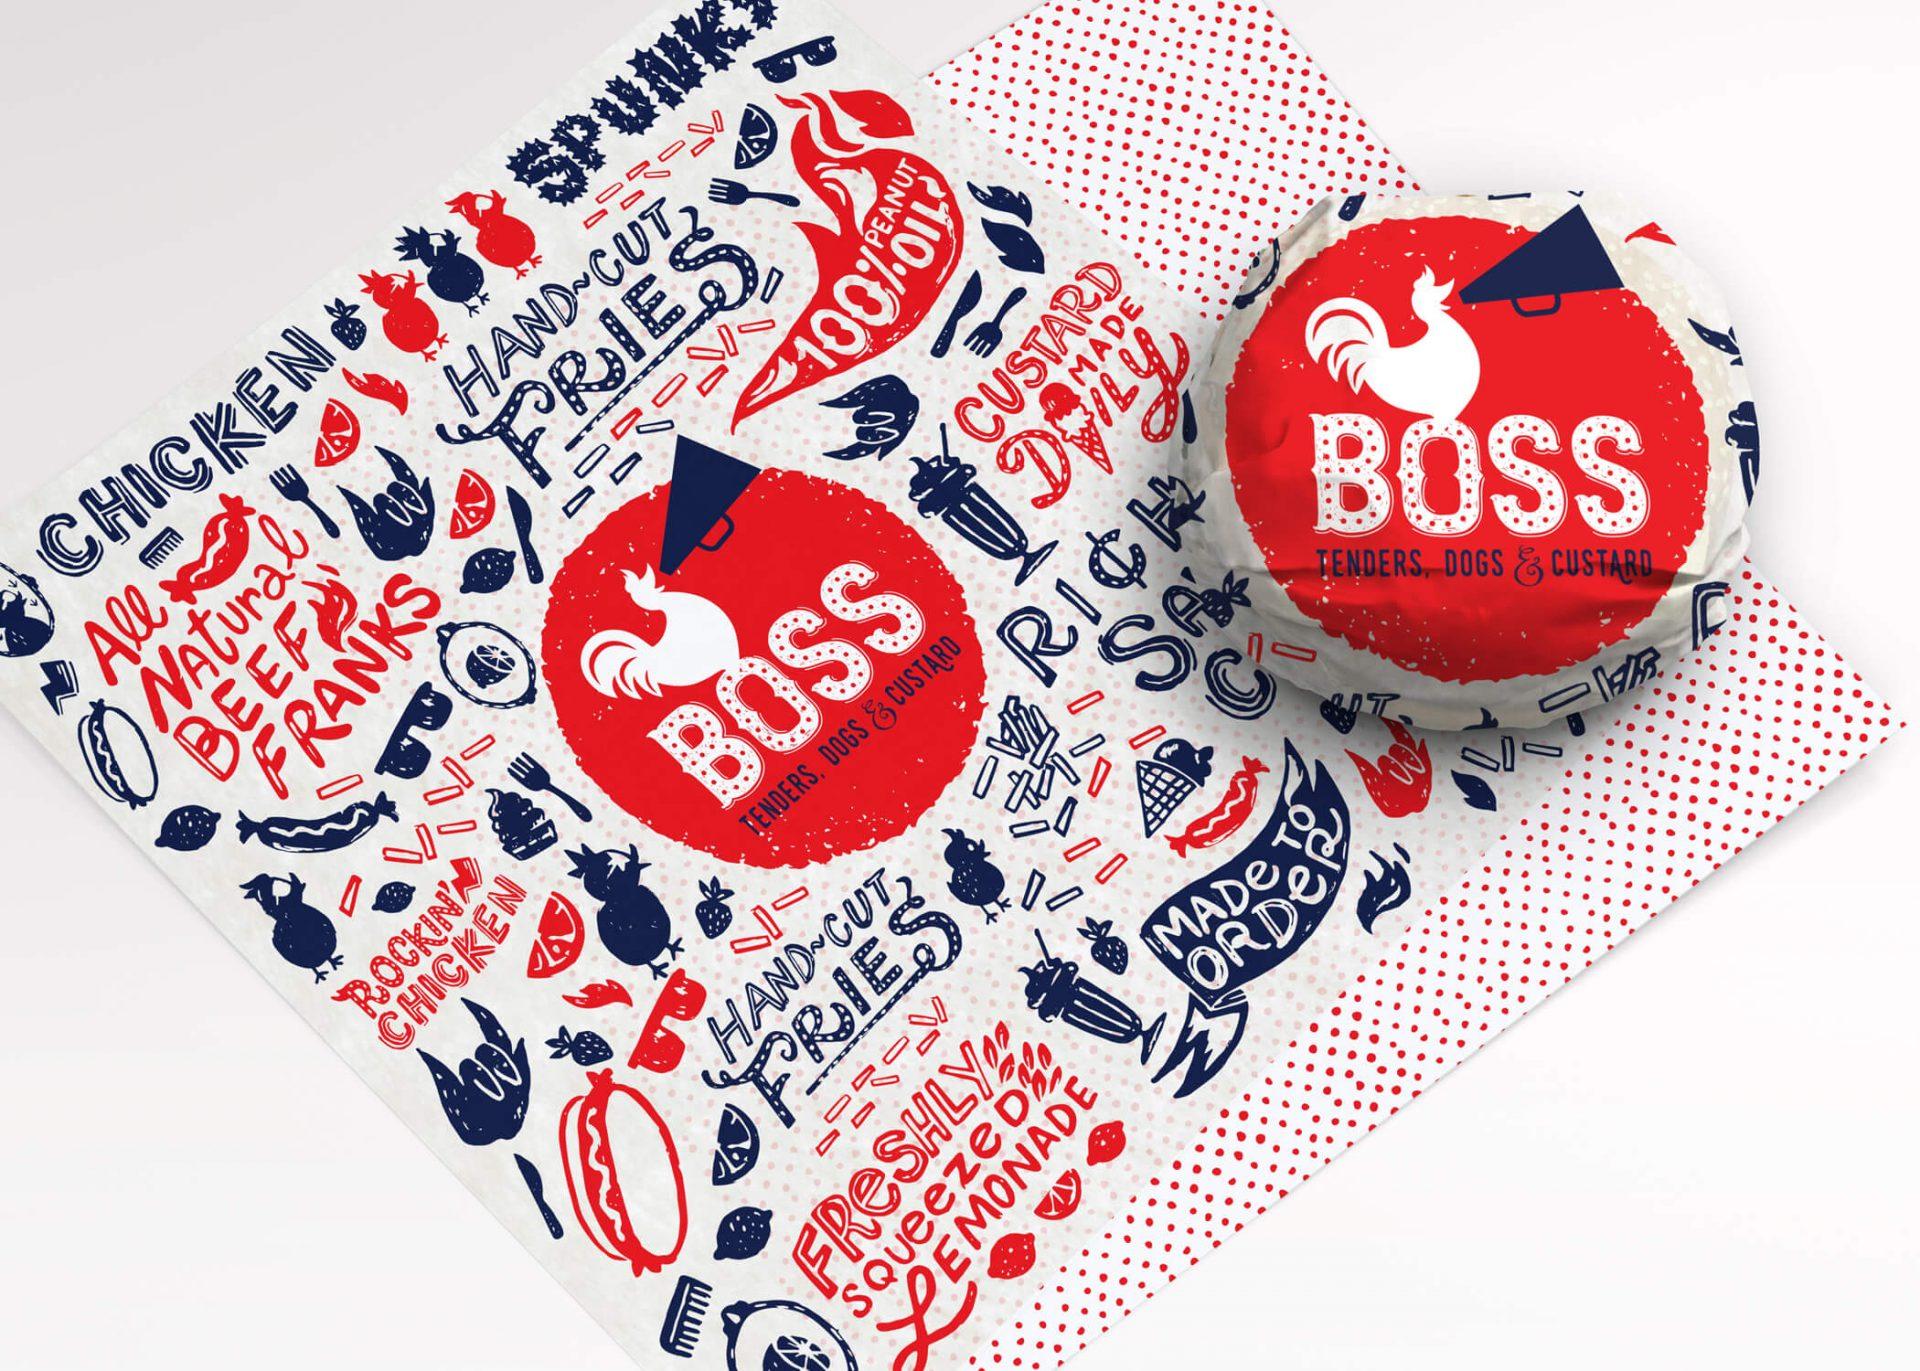 Boss Chicken Made By Eme Design Studio